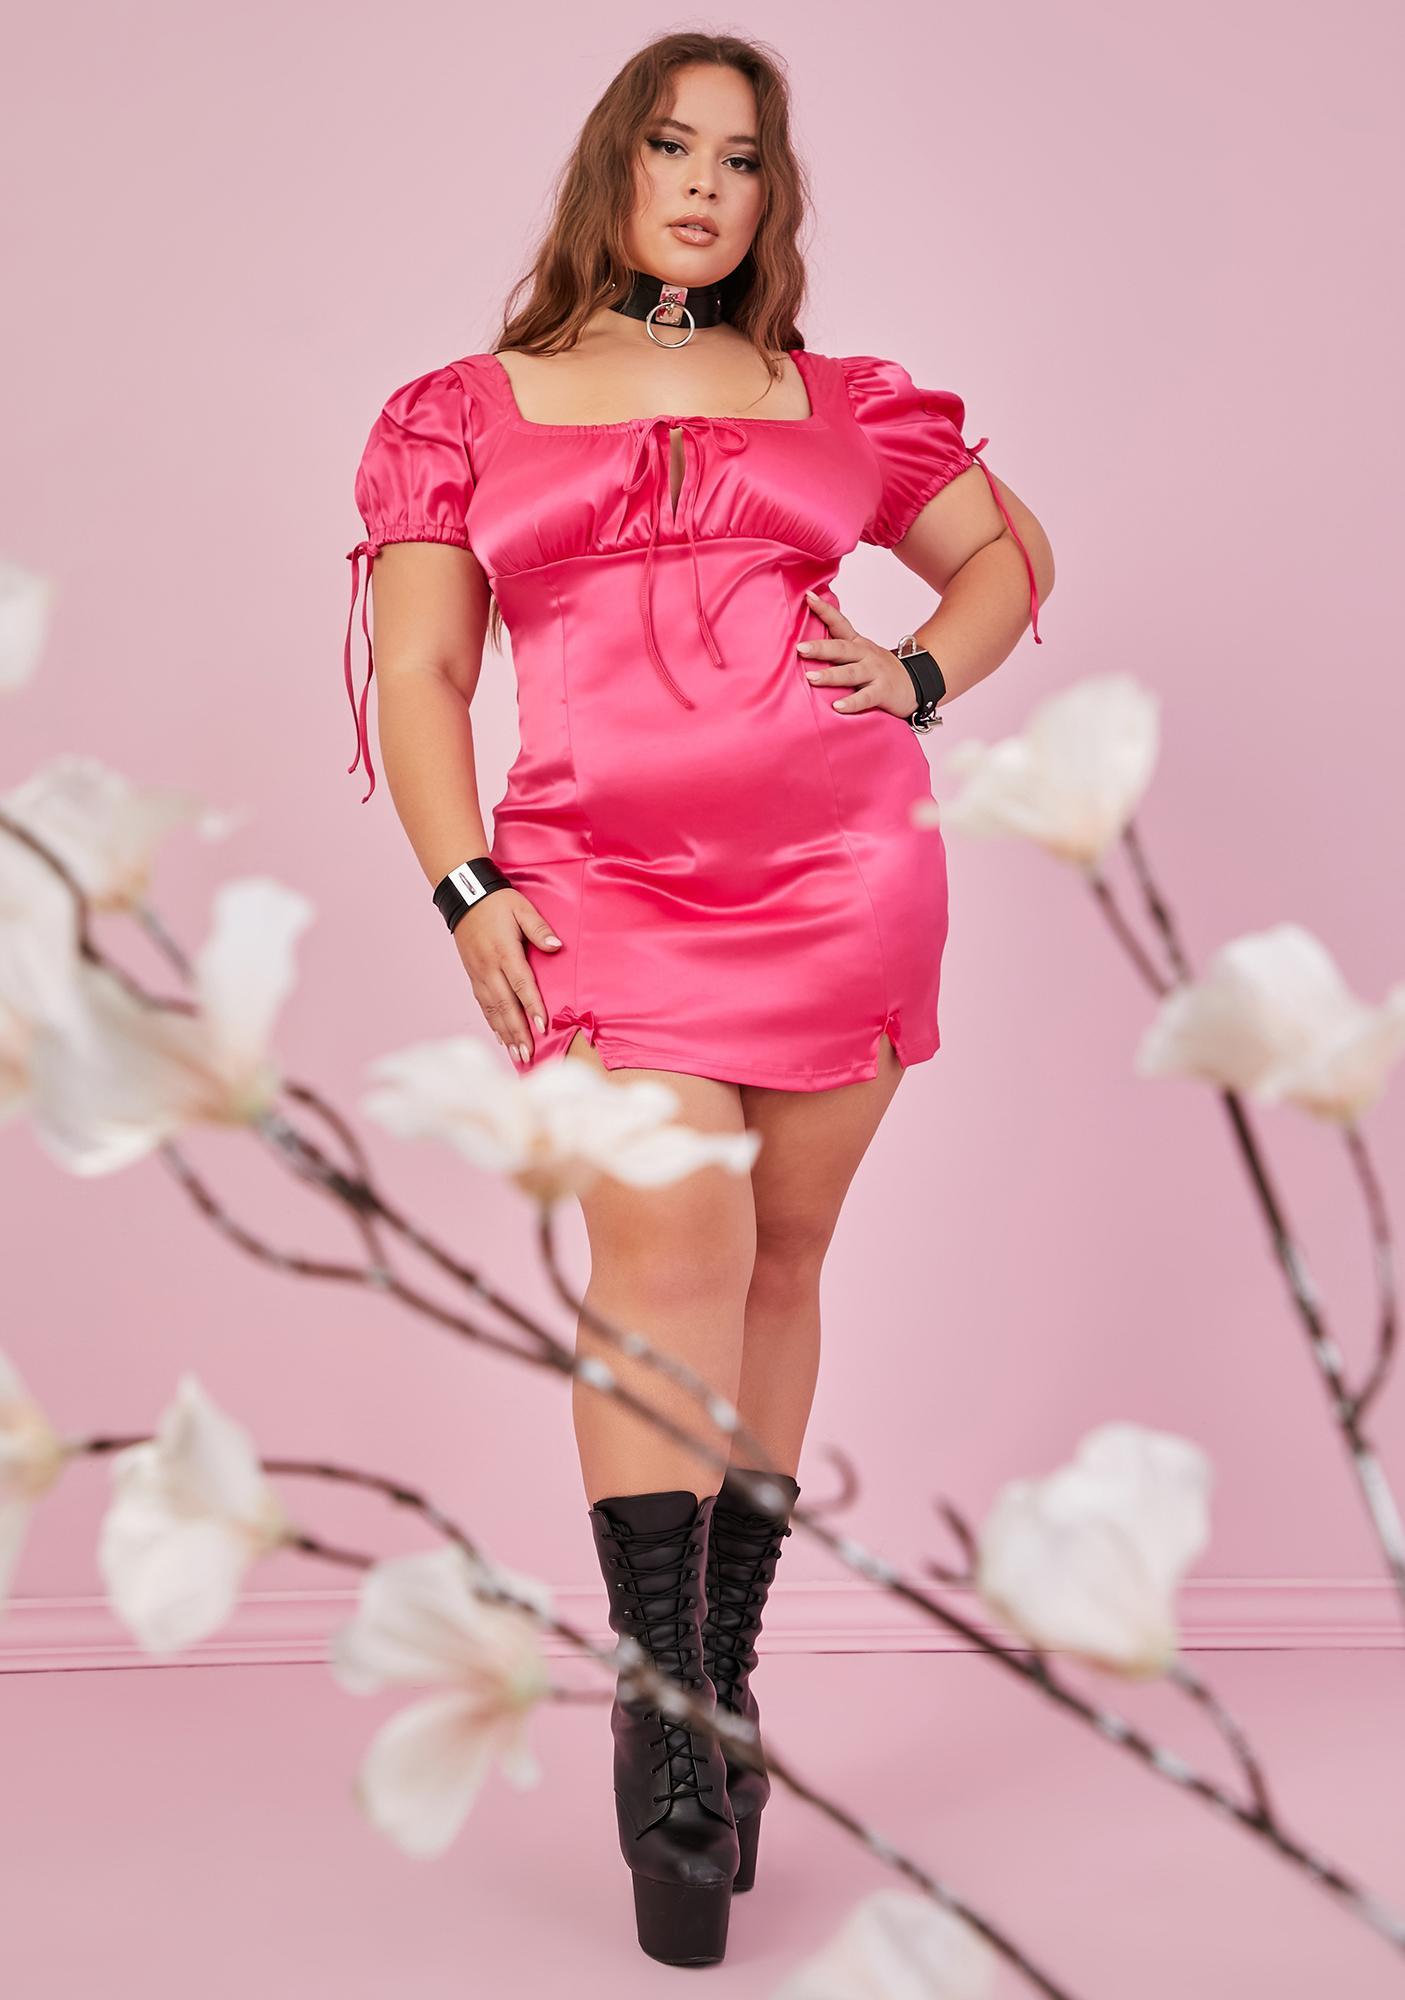 Sugar Thrillz Real Motives For Love Bodycon Dress